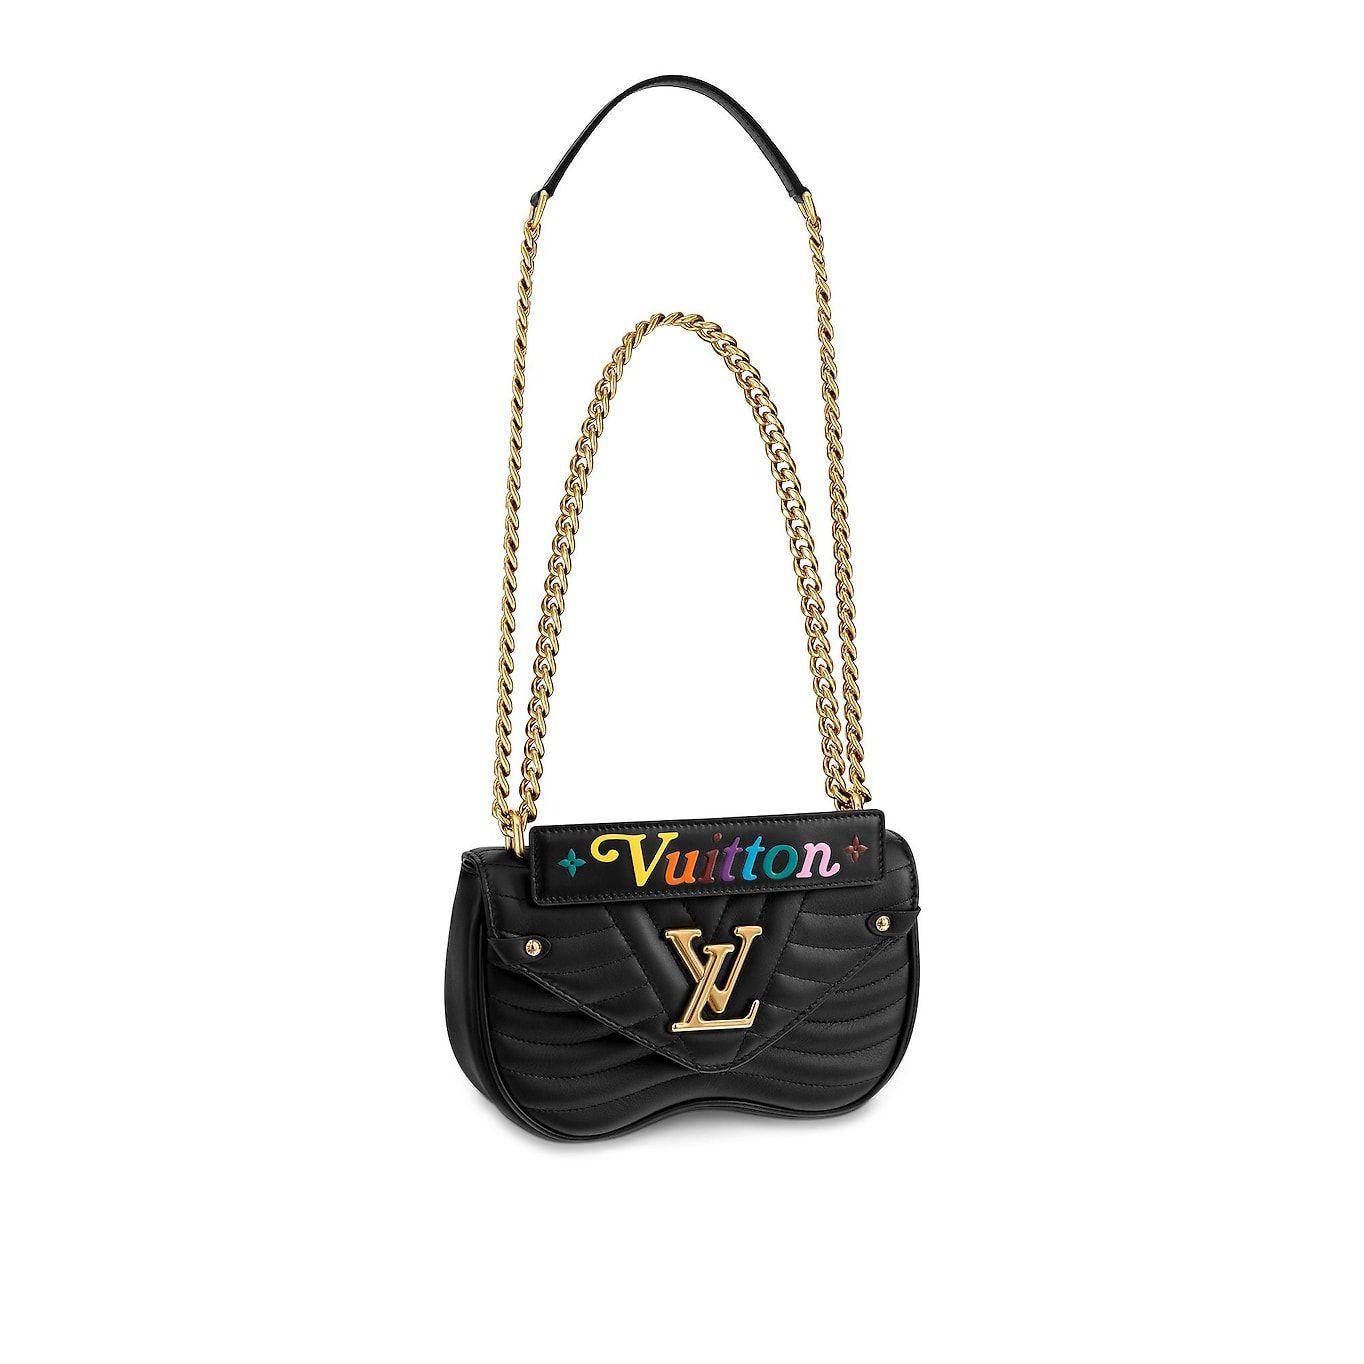 View 5 - Surene BB Monogram Empreinte Leather in Women s Handbags All  Handbags collections by Louis Vuitton  8b5736624044c